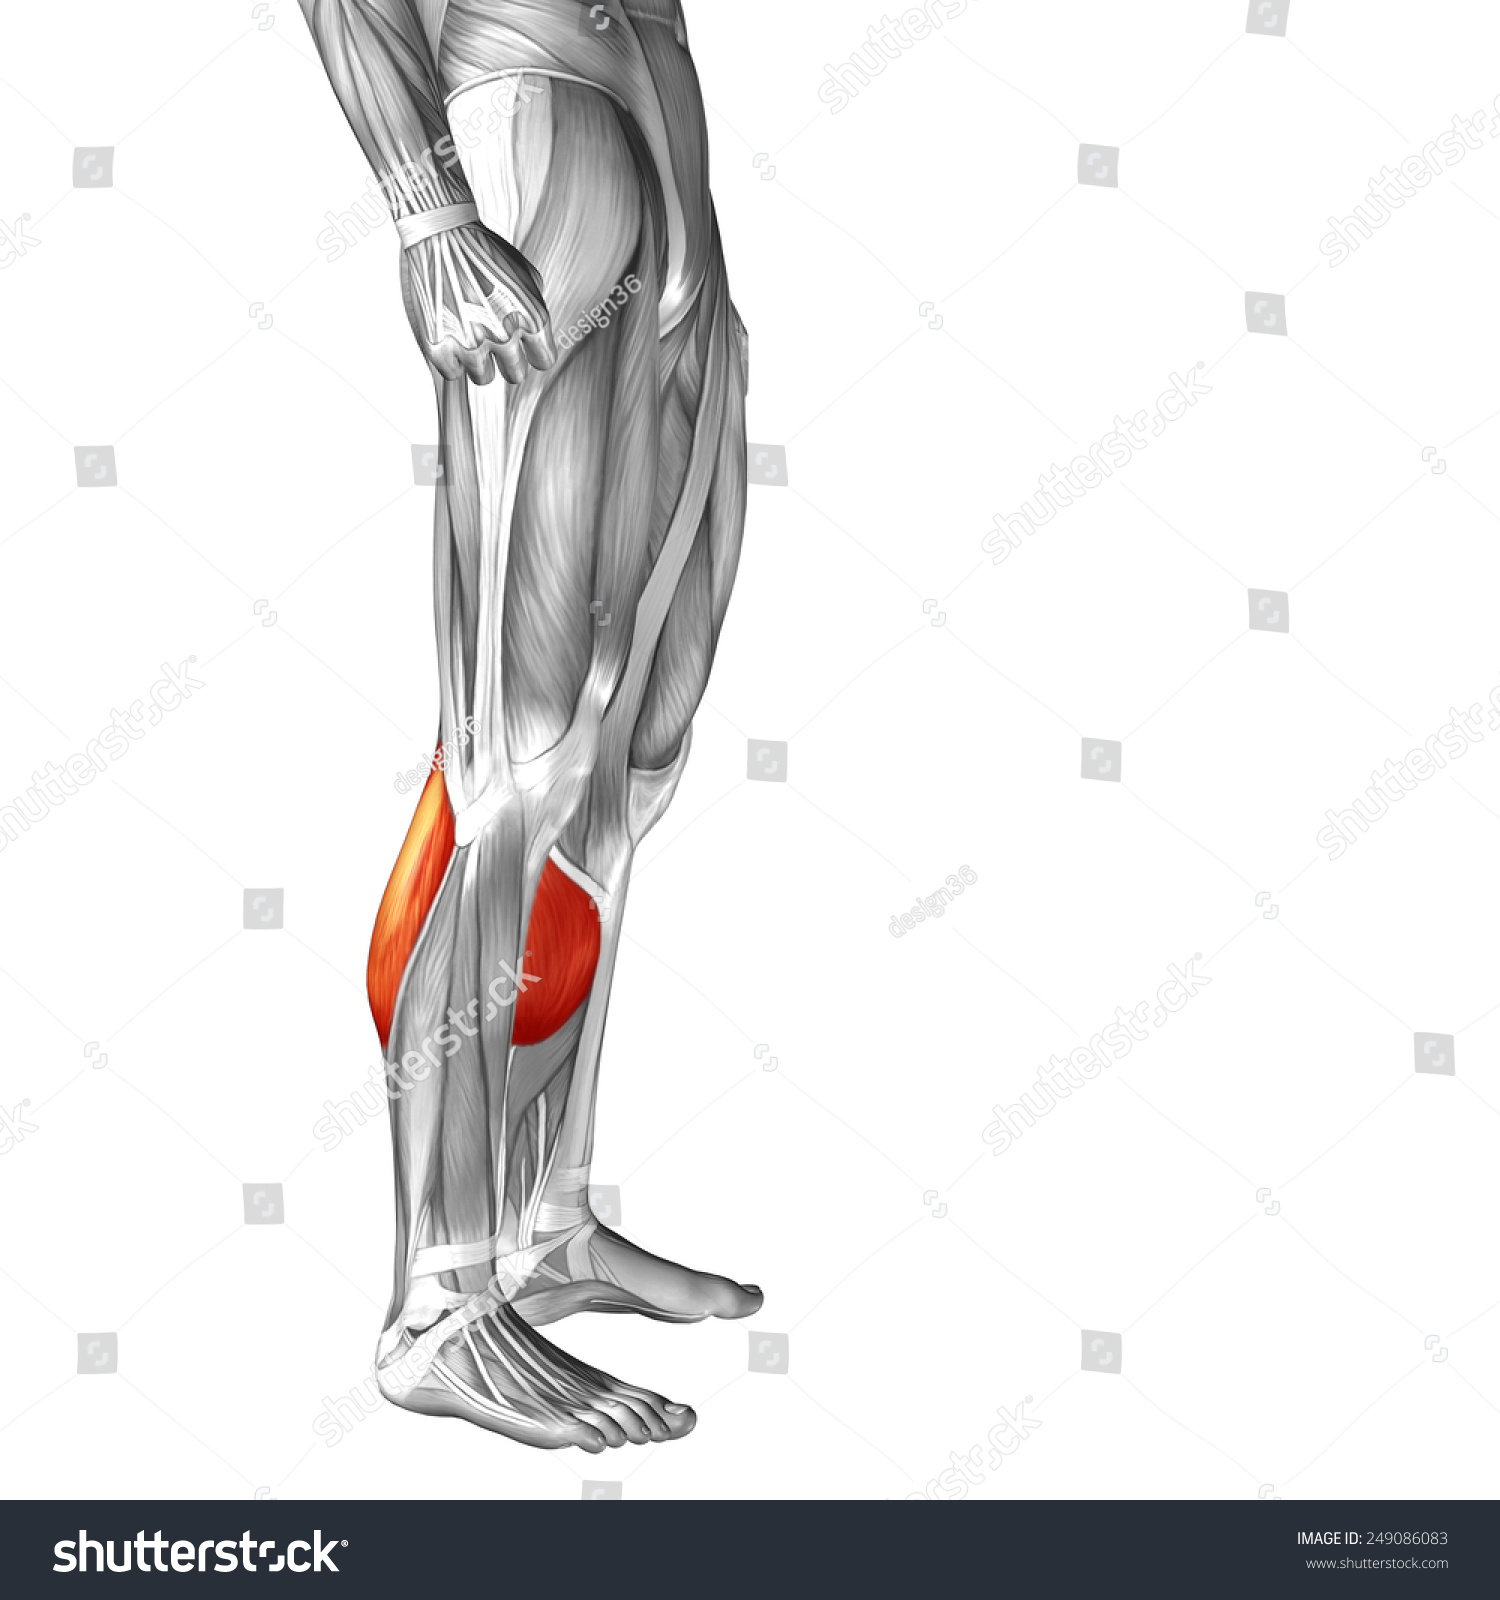 Conceptual 3 D Gastrocnemius Human Lower Leg Stock Illustration ...